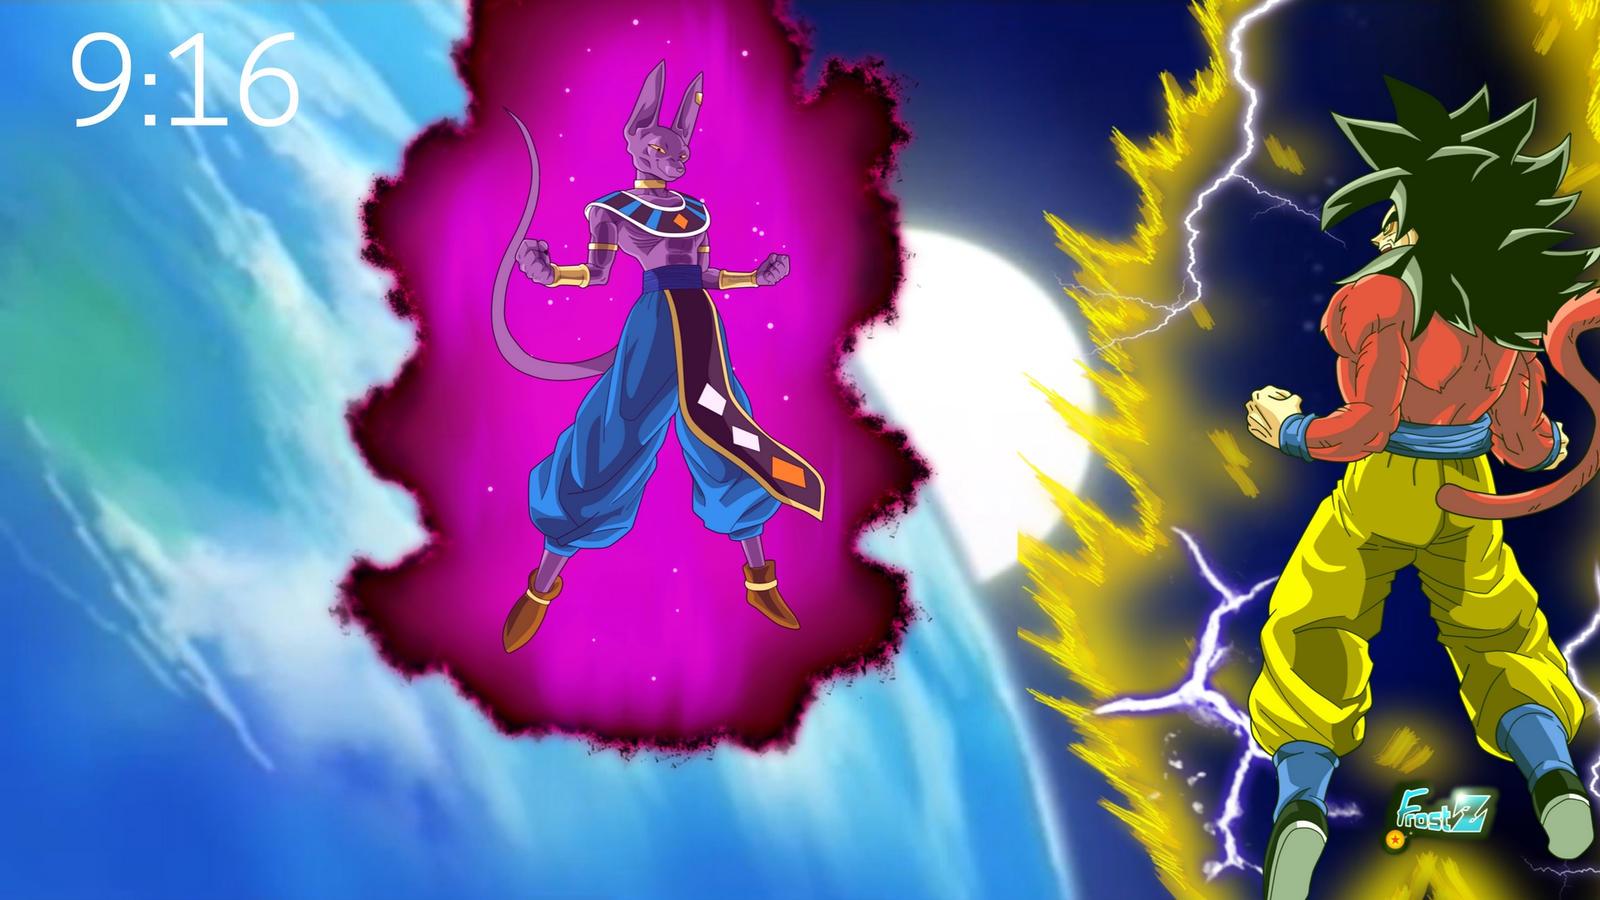 Ssj4 Goku Vs Beerus By Michaeld8489 On Deviantart